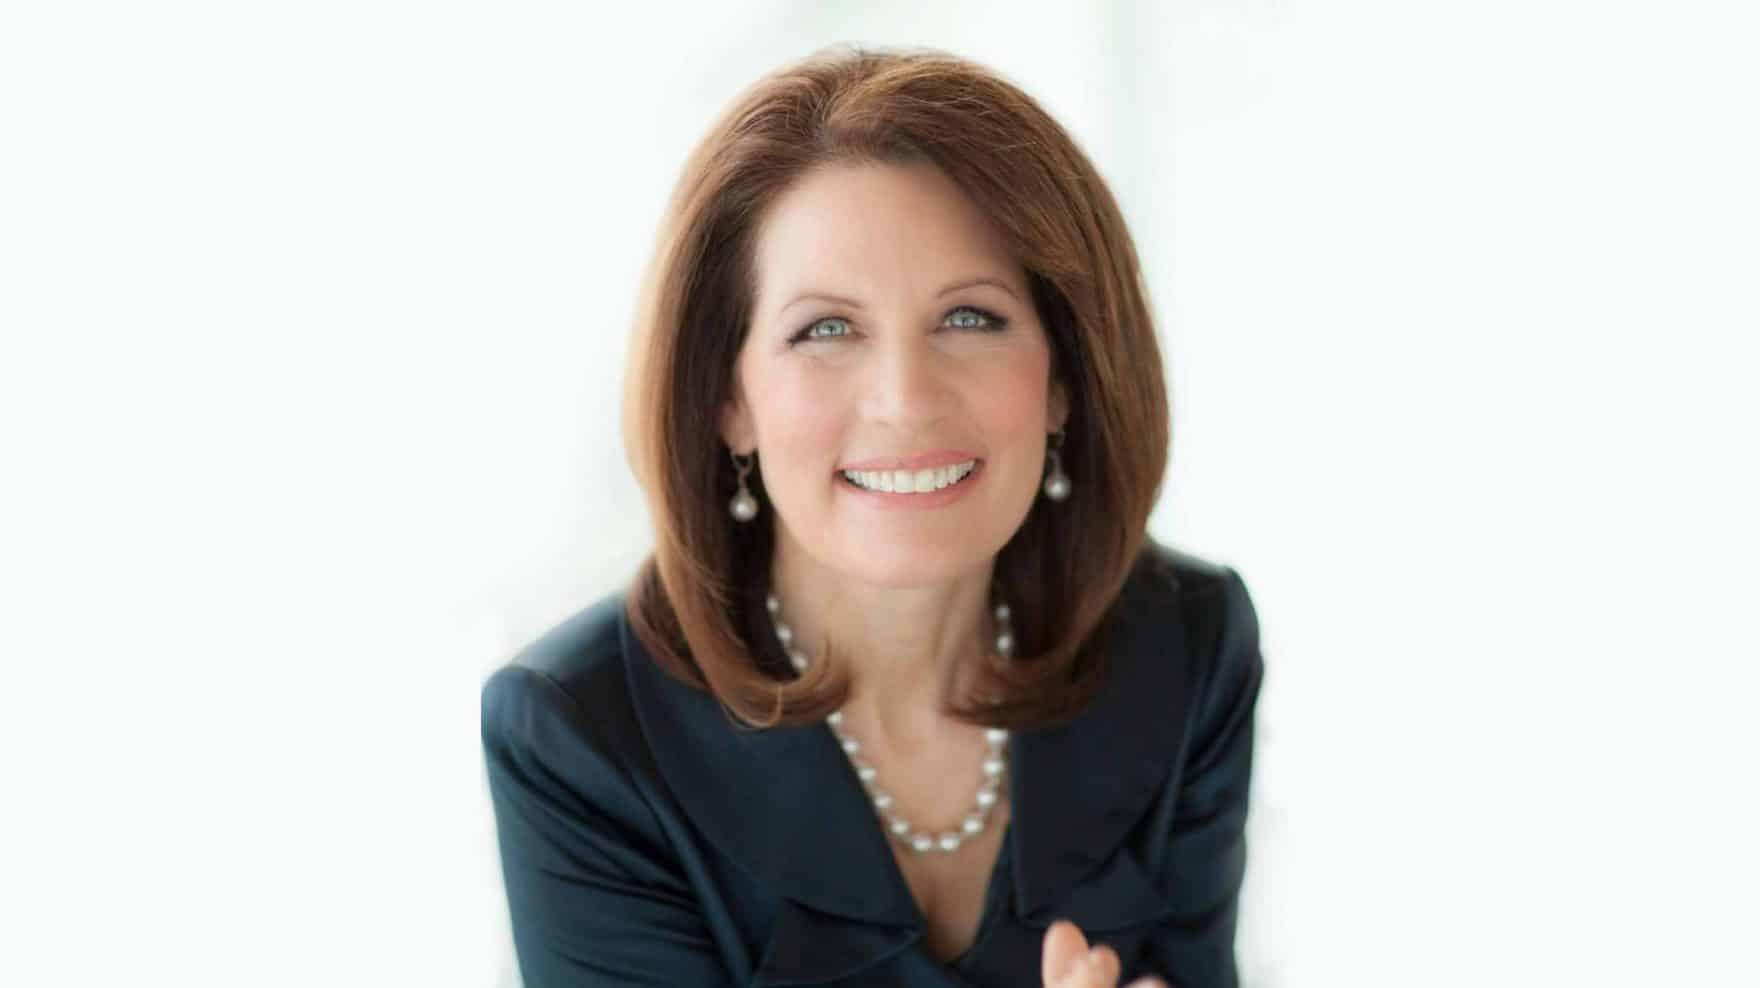 U.S. Congresswoman Michele Bachmann, the new dean of Regent University's Robertson School of Government.